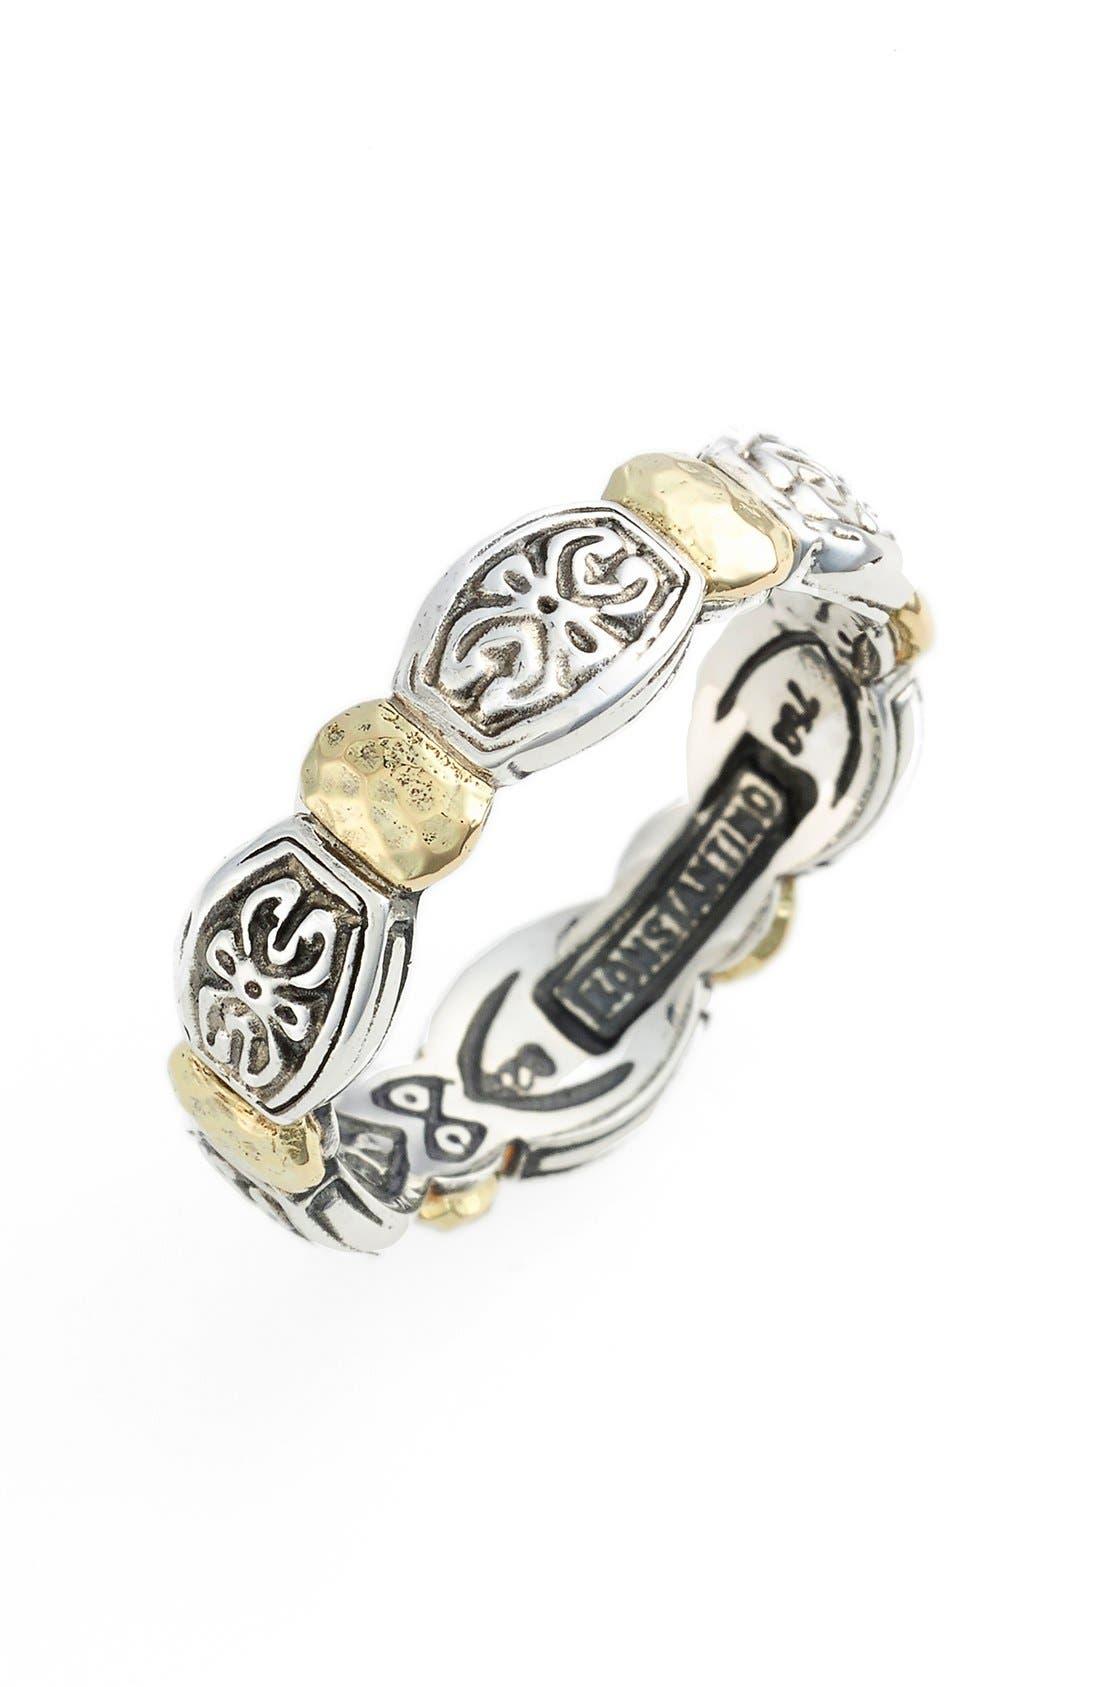 'Aspasia' Hammered Band Ring,                         Main,                         color, SILVER/ GOLD